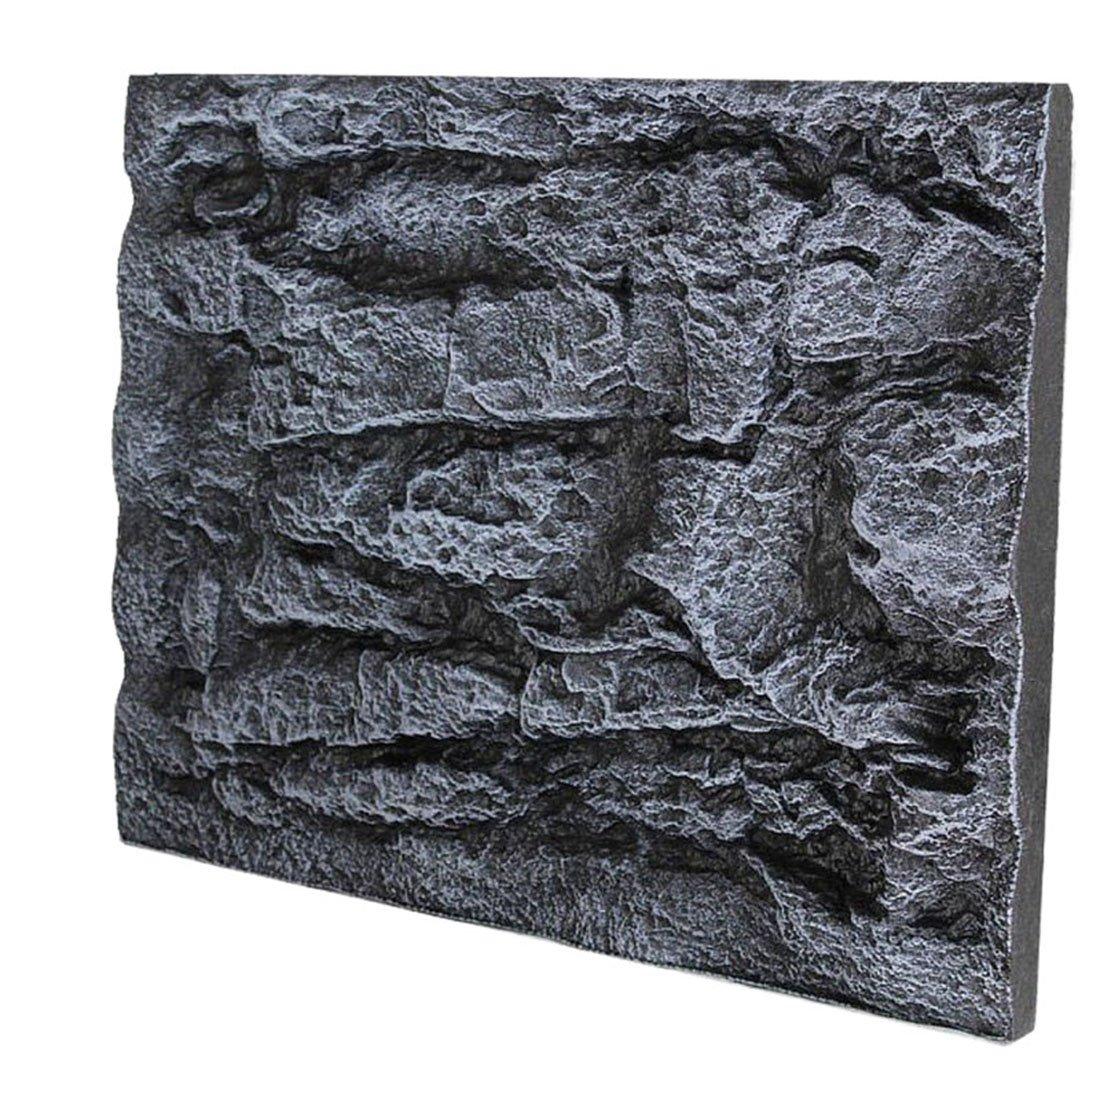 Jiyaru 3D Foam Rocks Background Fish Tank Board Aquarium Backdrop Decor 23x17 #2